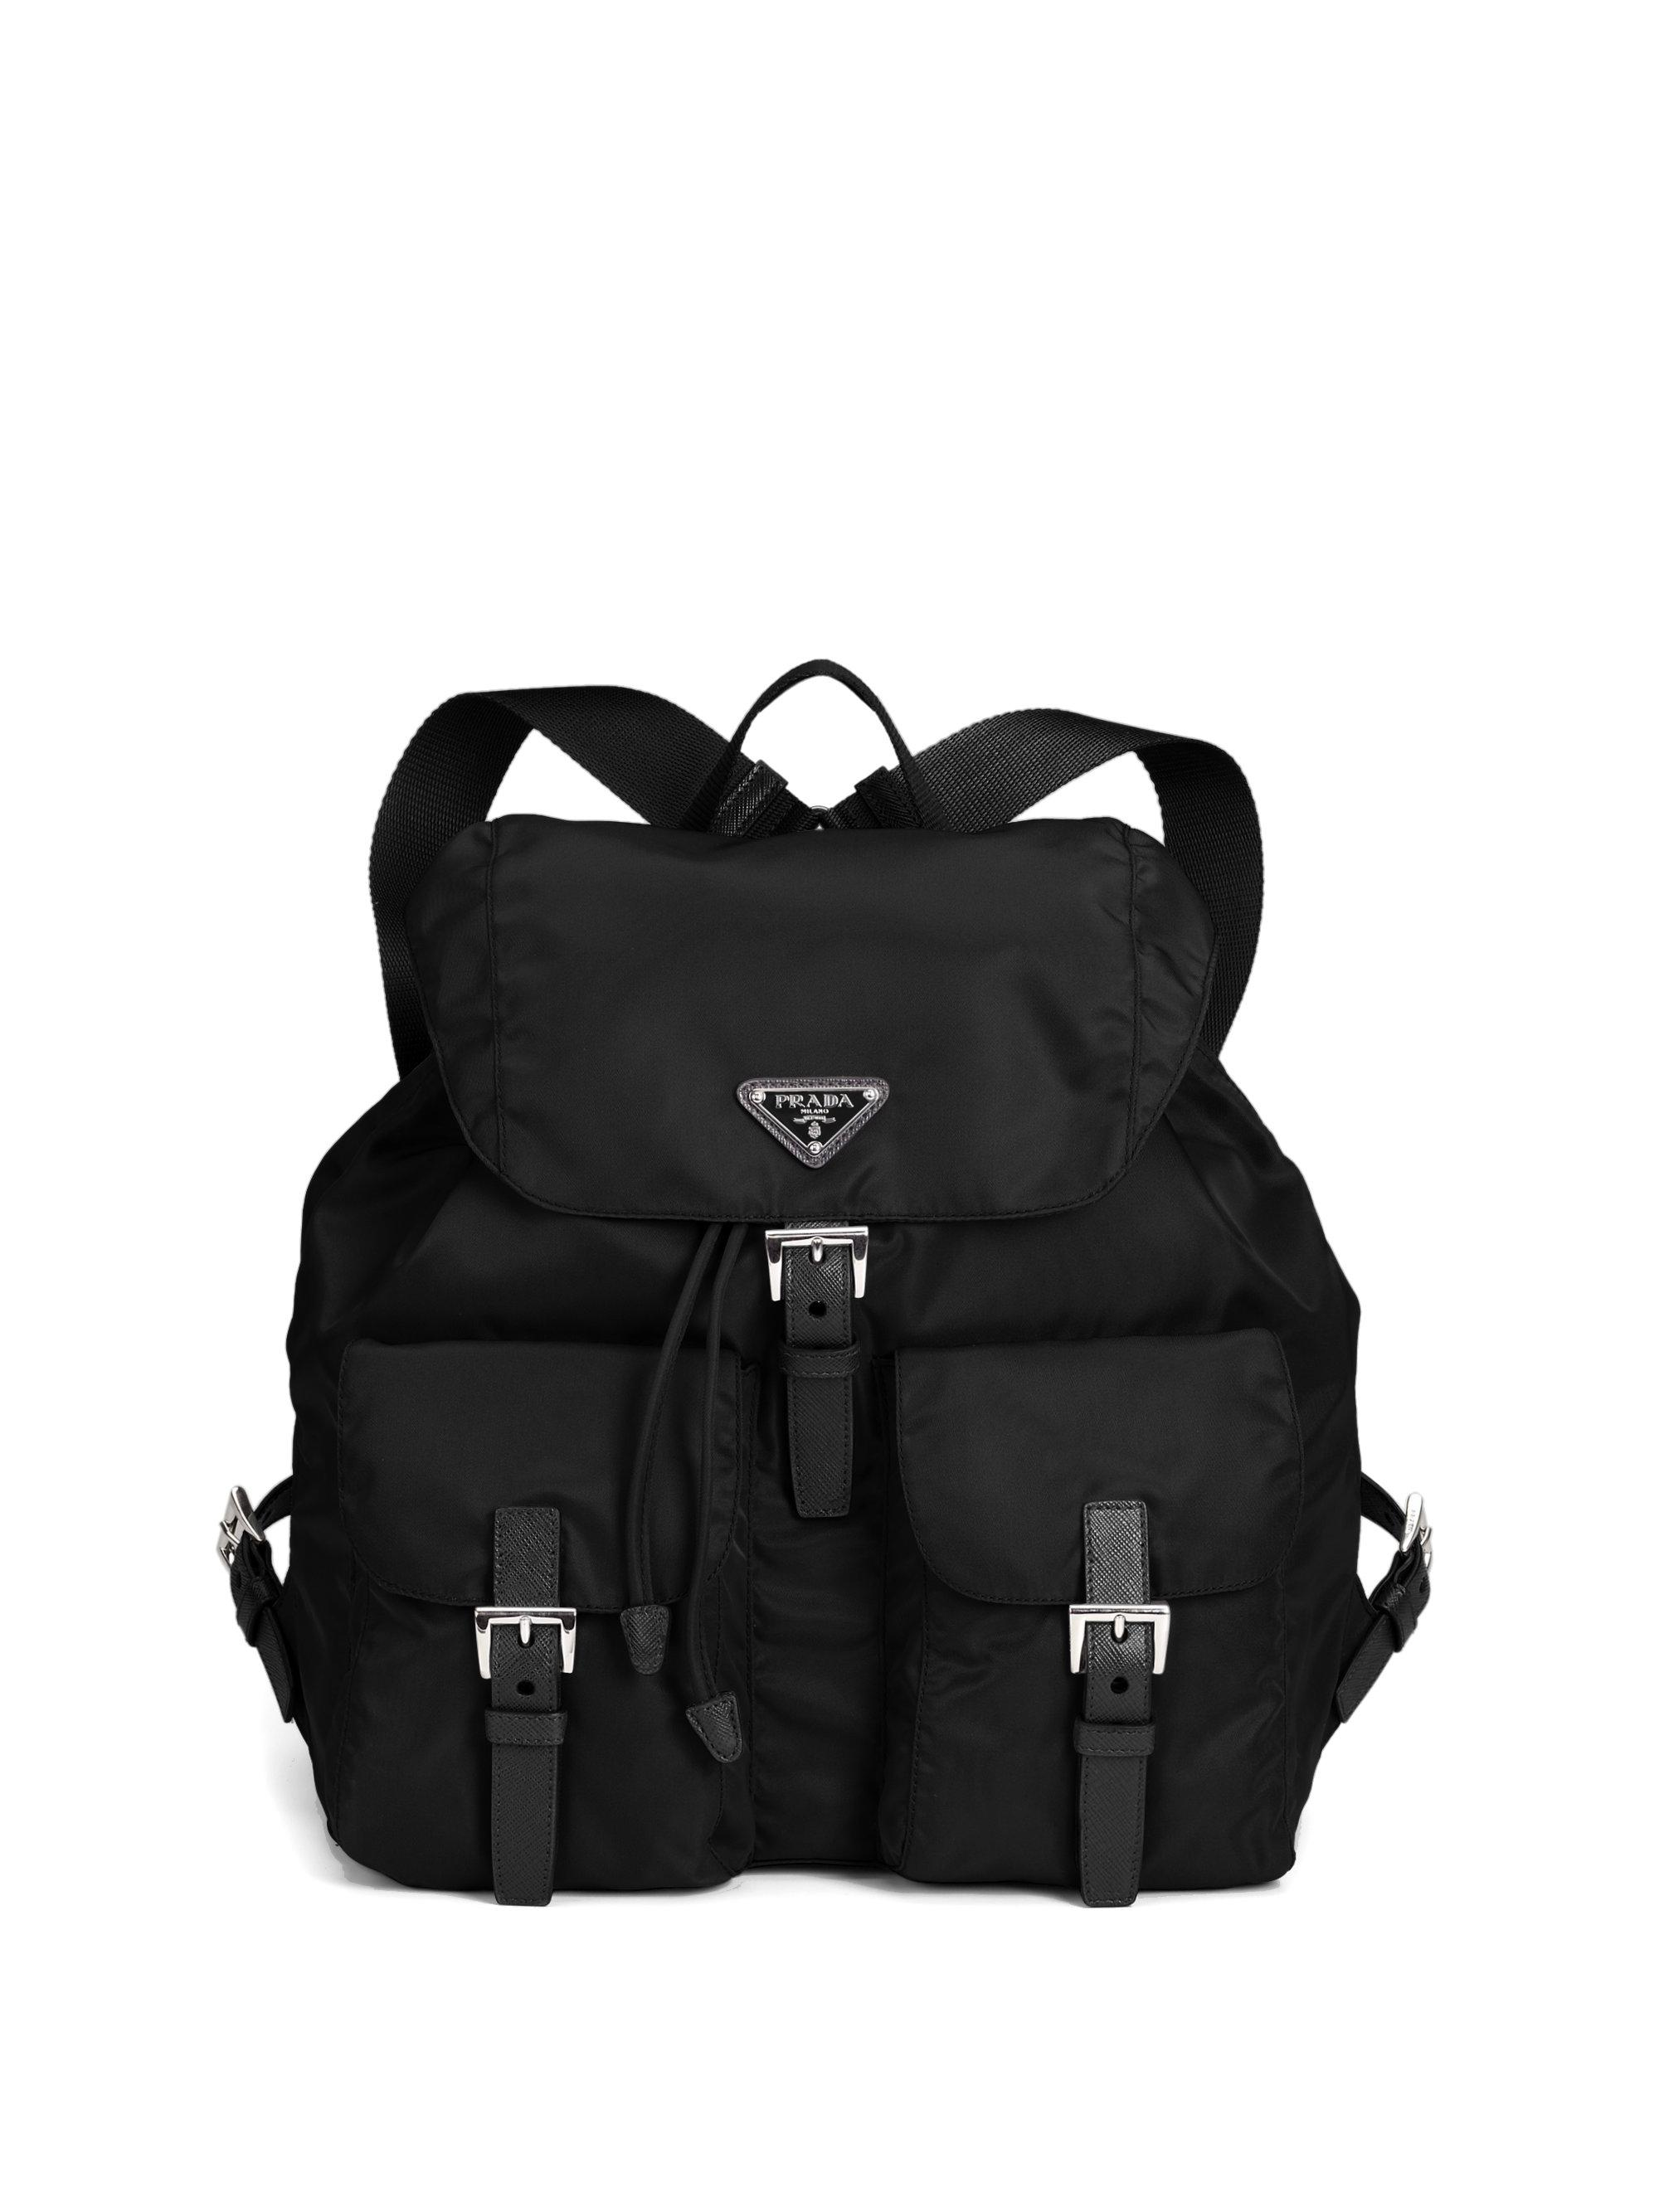 a03be98b65da Prada Nylon Backpack Large- Fenix Toulouse Handball